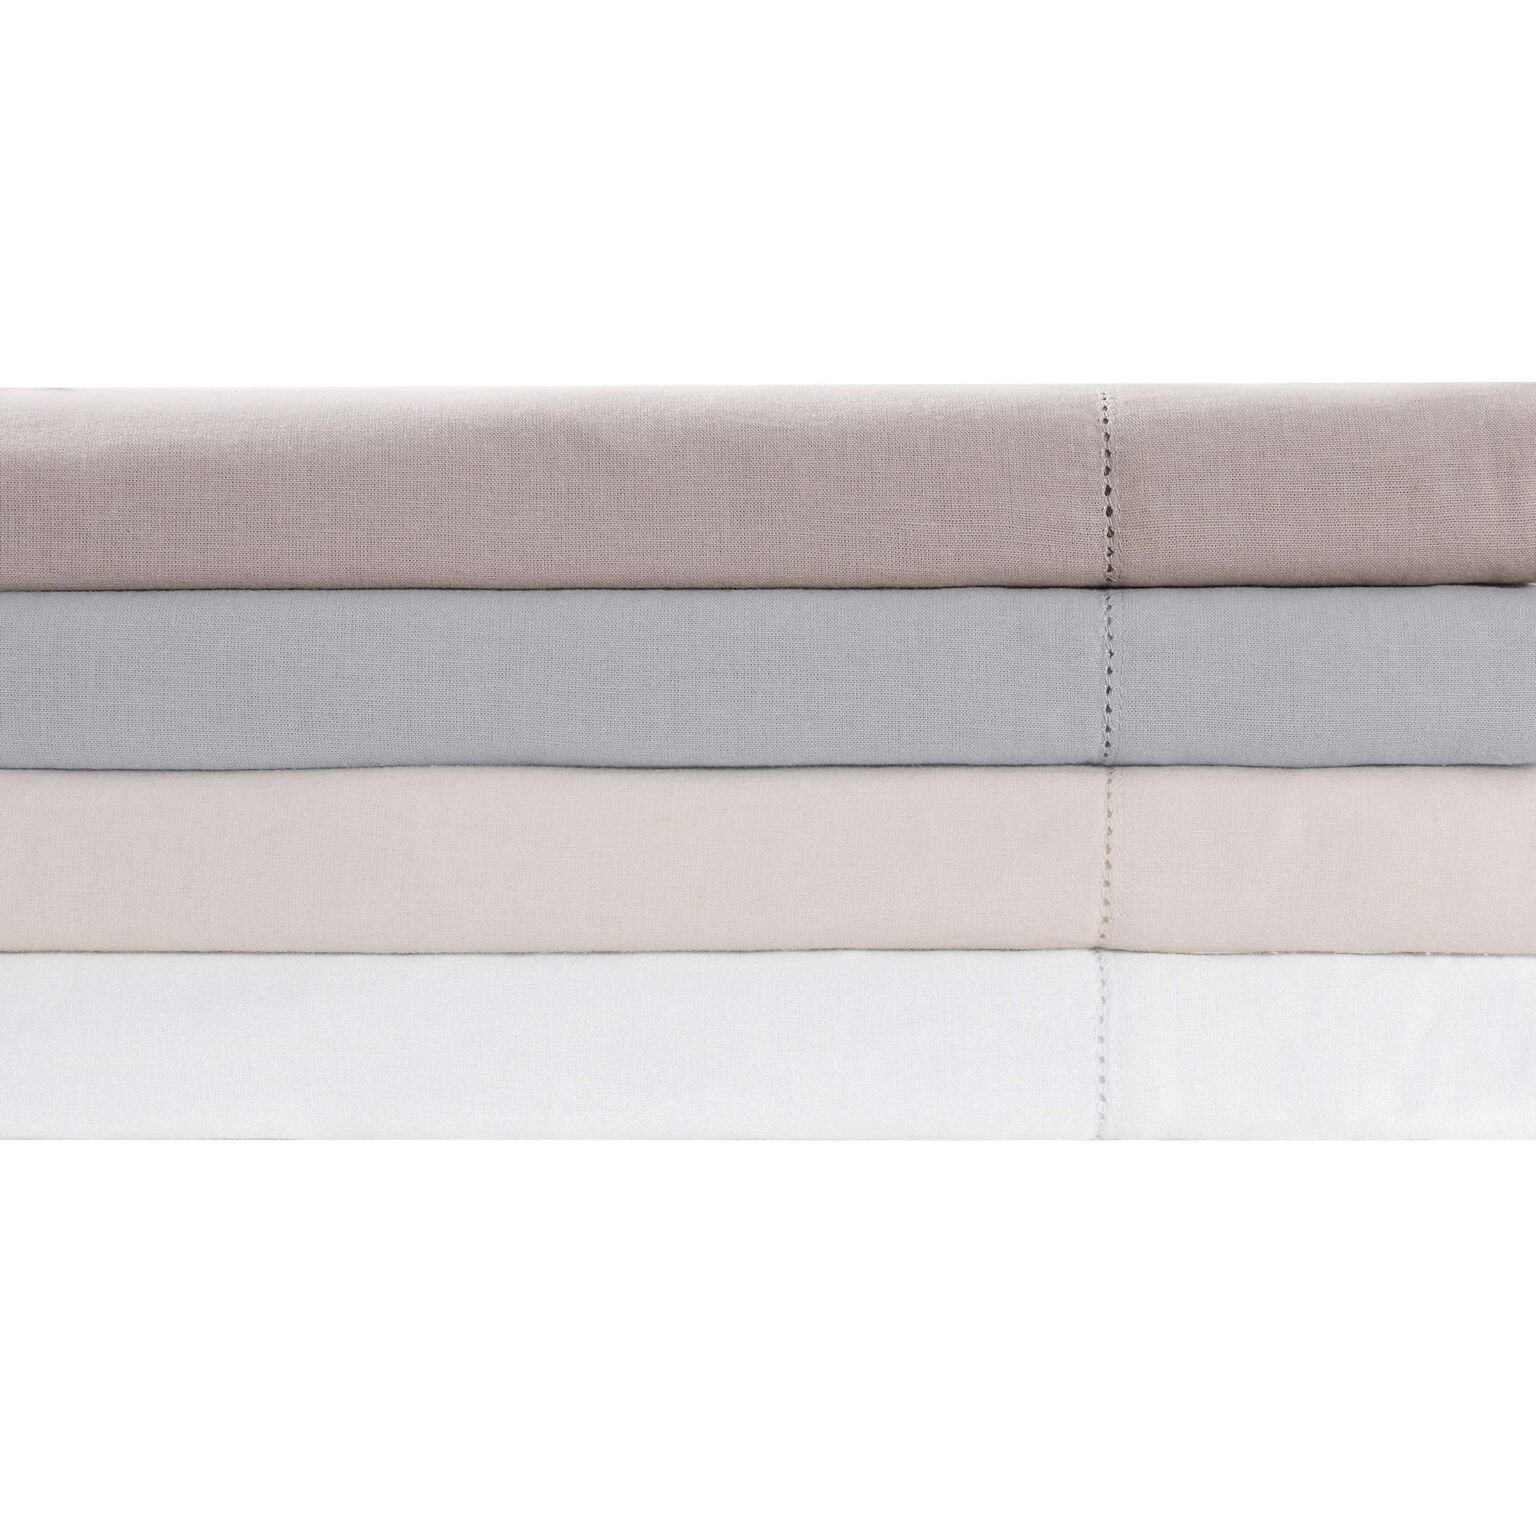 Charisma Luxe Cotton Linen s, Standard Pillowcases, Ivory